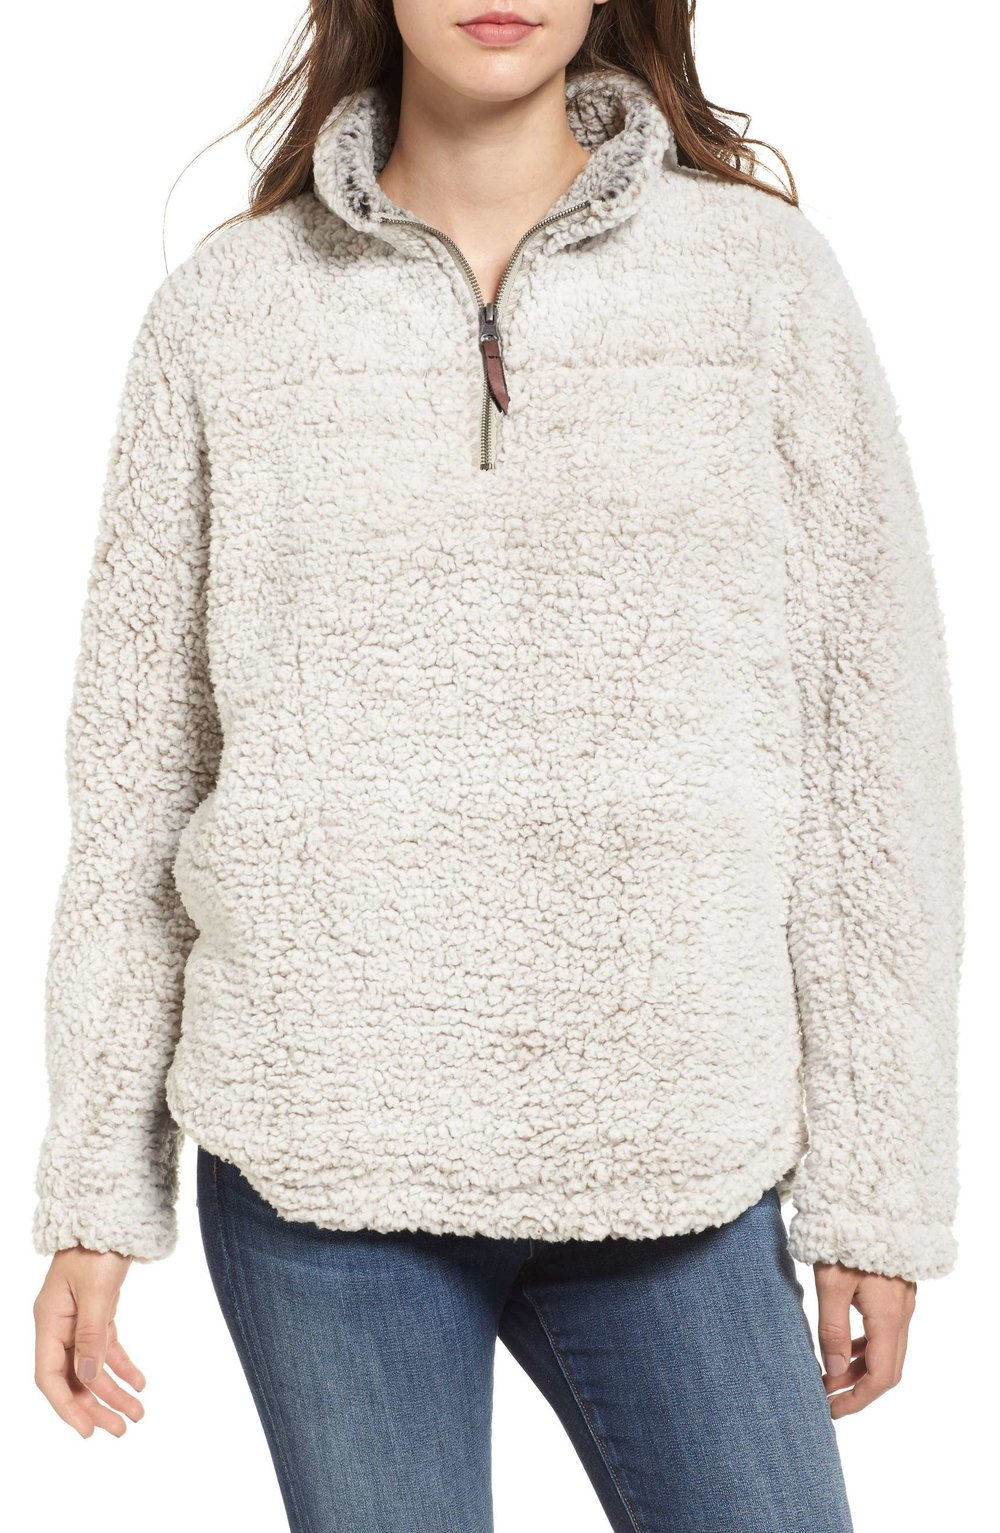 Fleece Pullover .